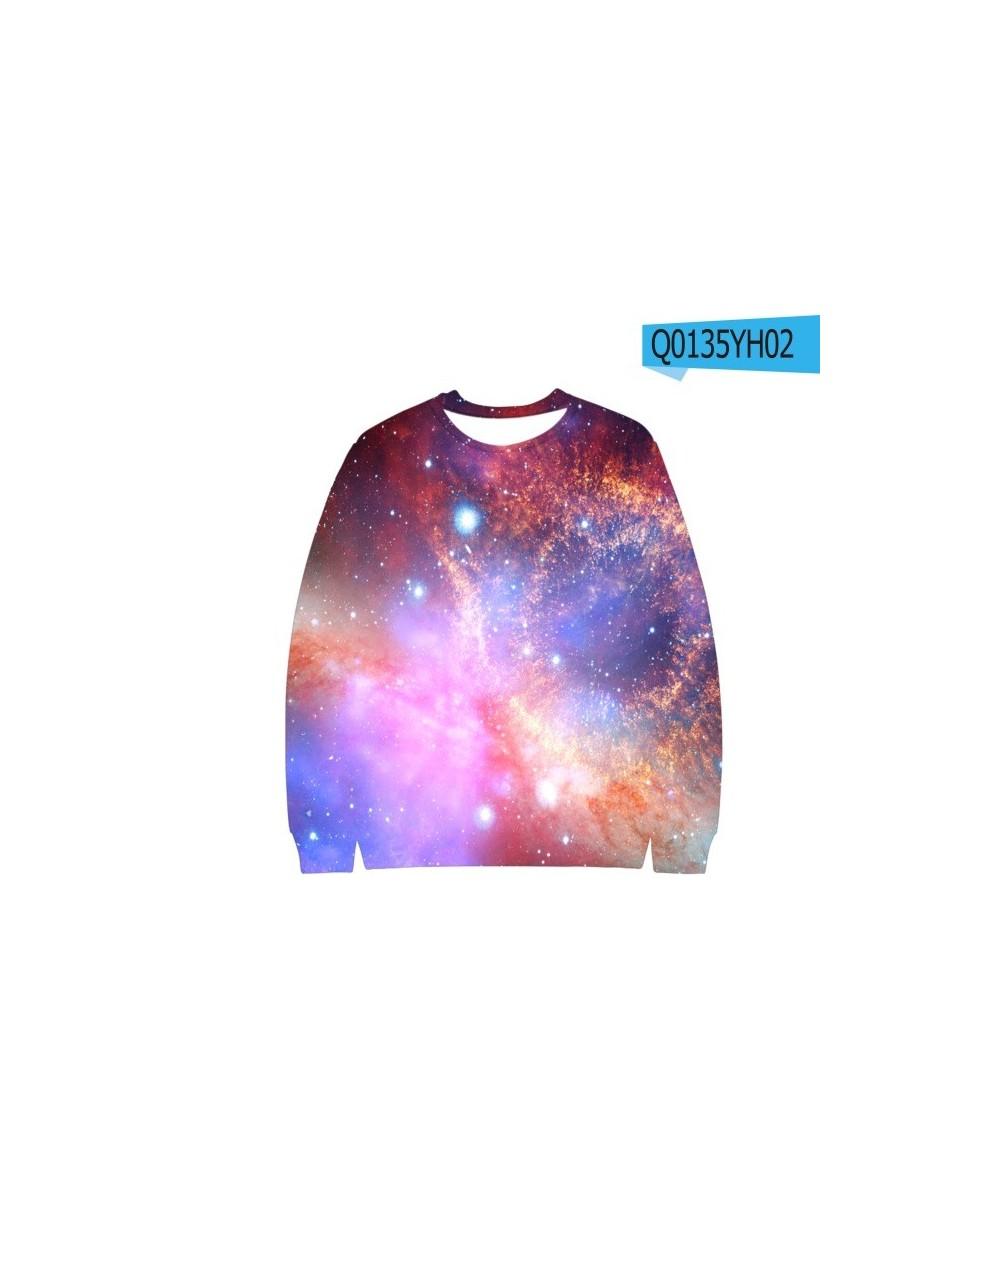 3D Galaxy Starry Sky Autumn/winter Sweatshirts New Harajuku Jumper Unisex Outwear Cool Young Casual Sweatshirts - Q0135 - 4L...